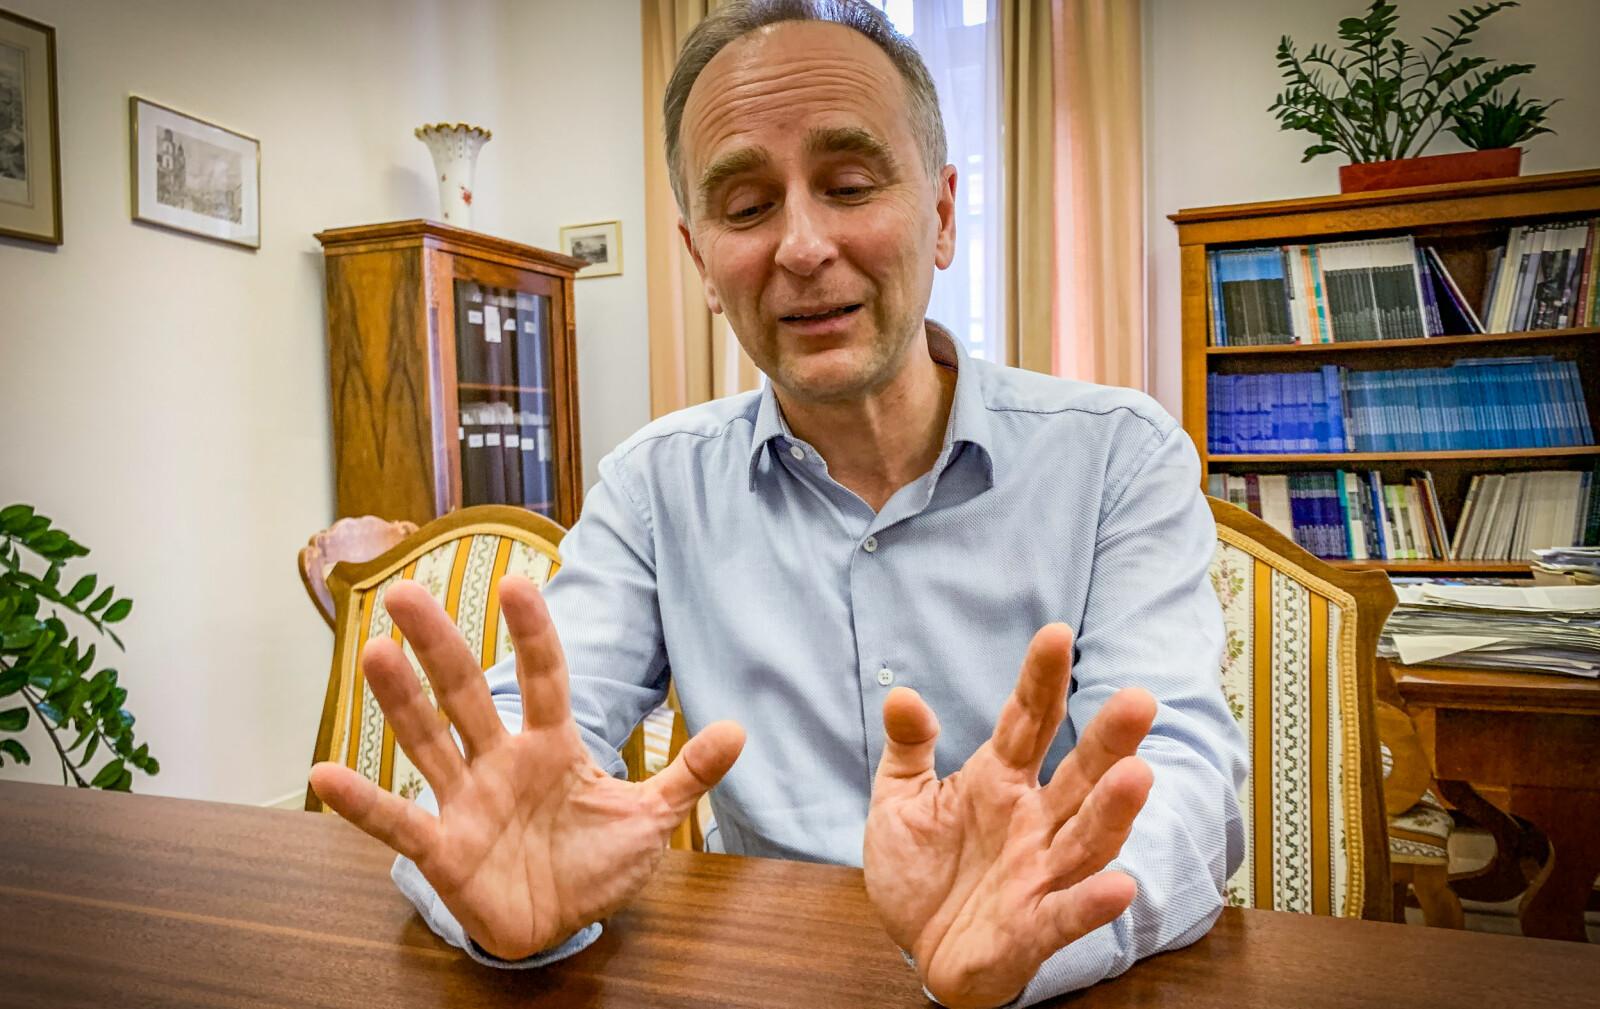 Prorektor Zsolt Enyedi ved Det sentraleuropeiske universtet (CEU). Foto: Espen Løkeland-Stai